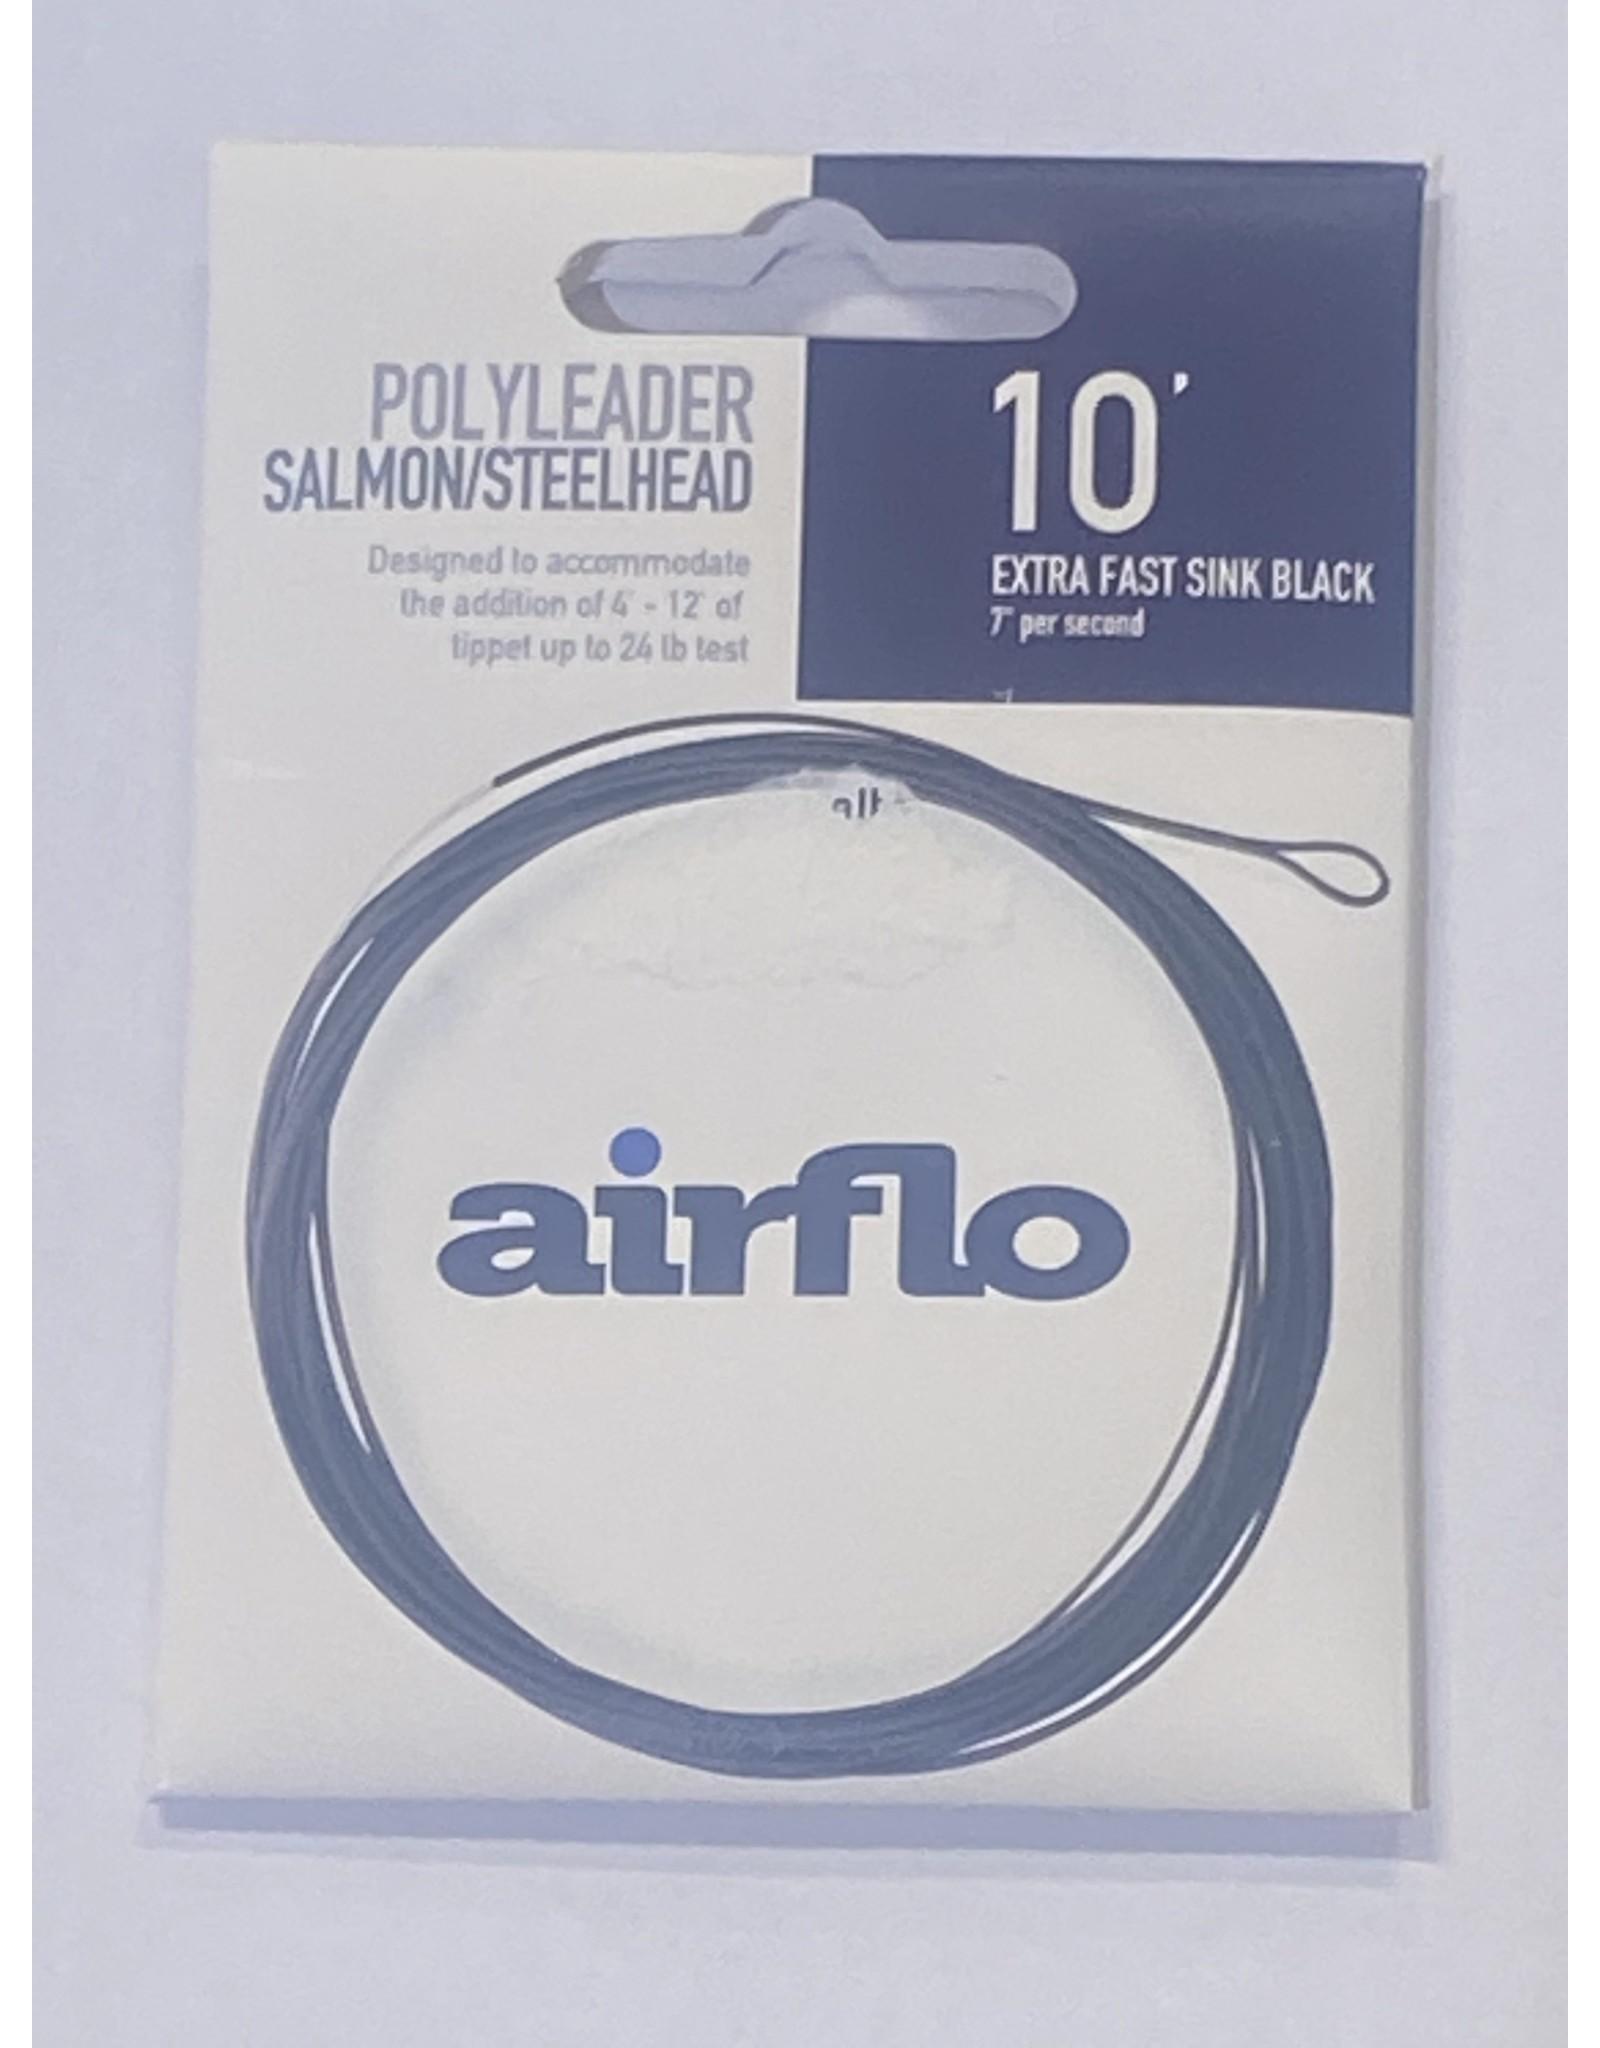 Airflo Airflo Salmon/Steelhead Poly Leader 10' Extra Fast Sink Black 7ips